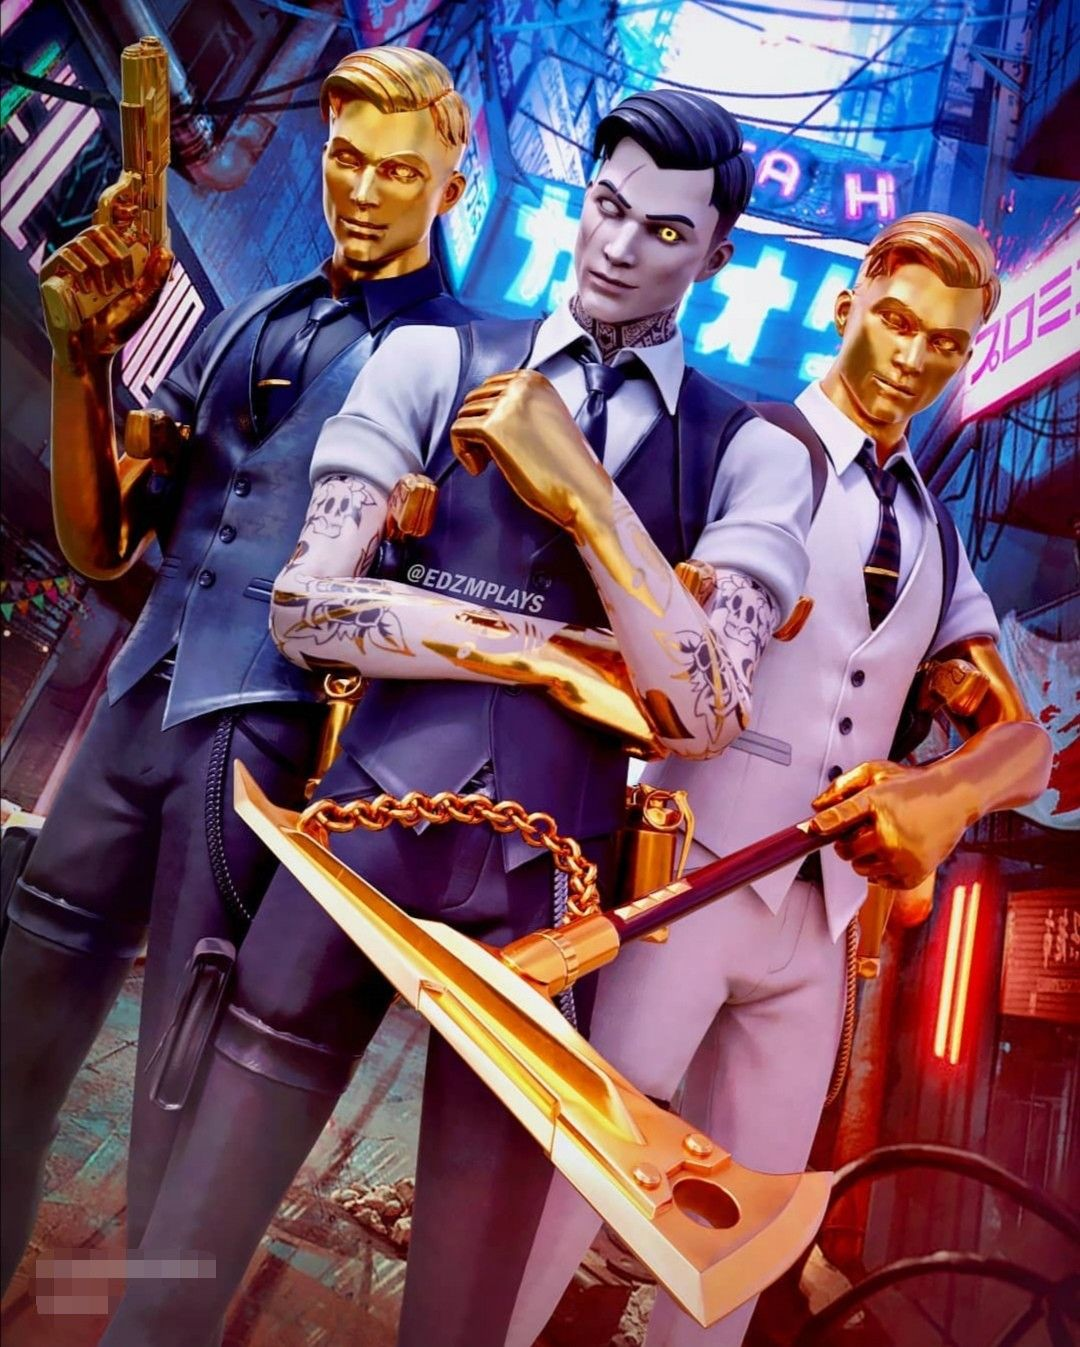 Fortnite Season 2 Chapter 2 Skins In 2020 Best Gaming Wallpapers Gaming Wallpapers Deadpool Wallpaper